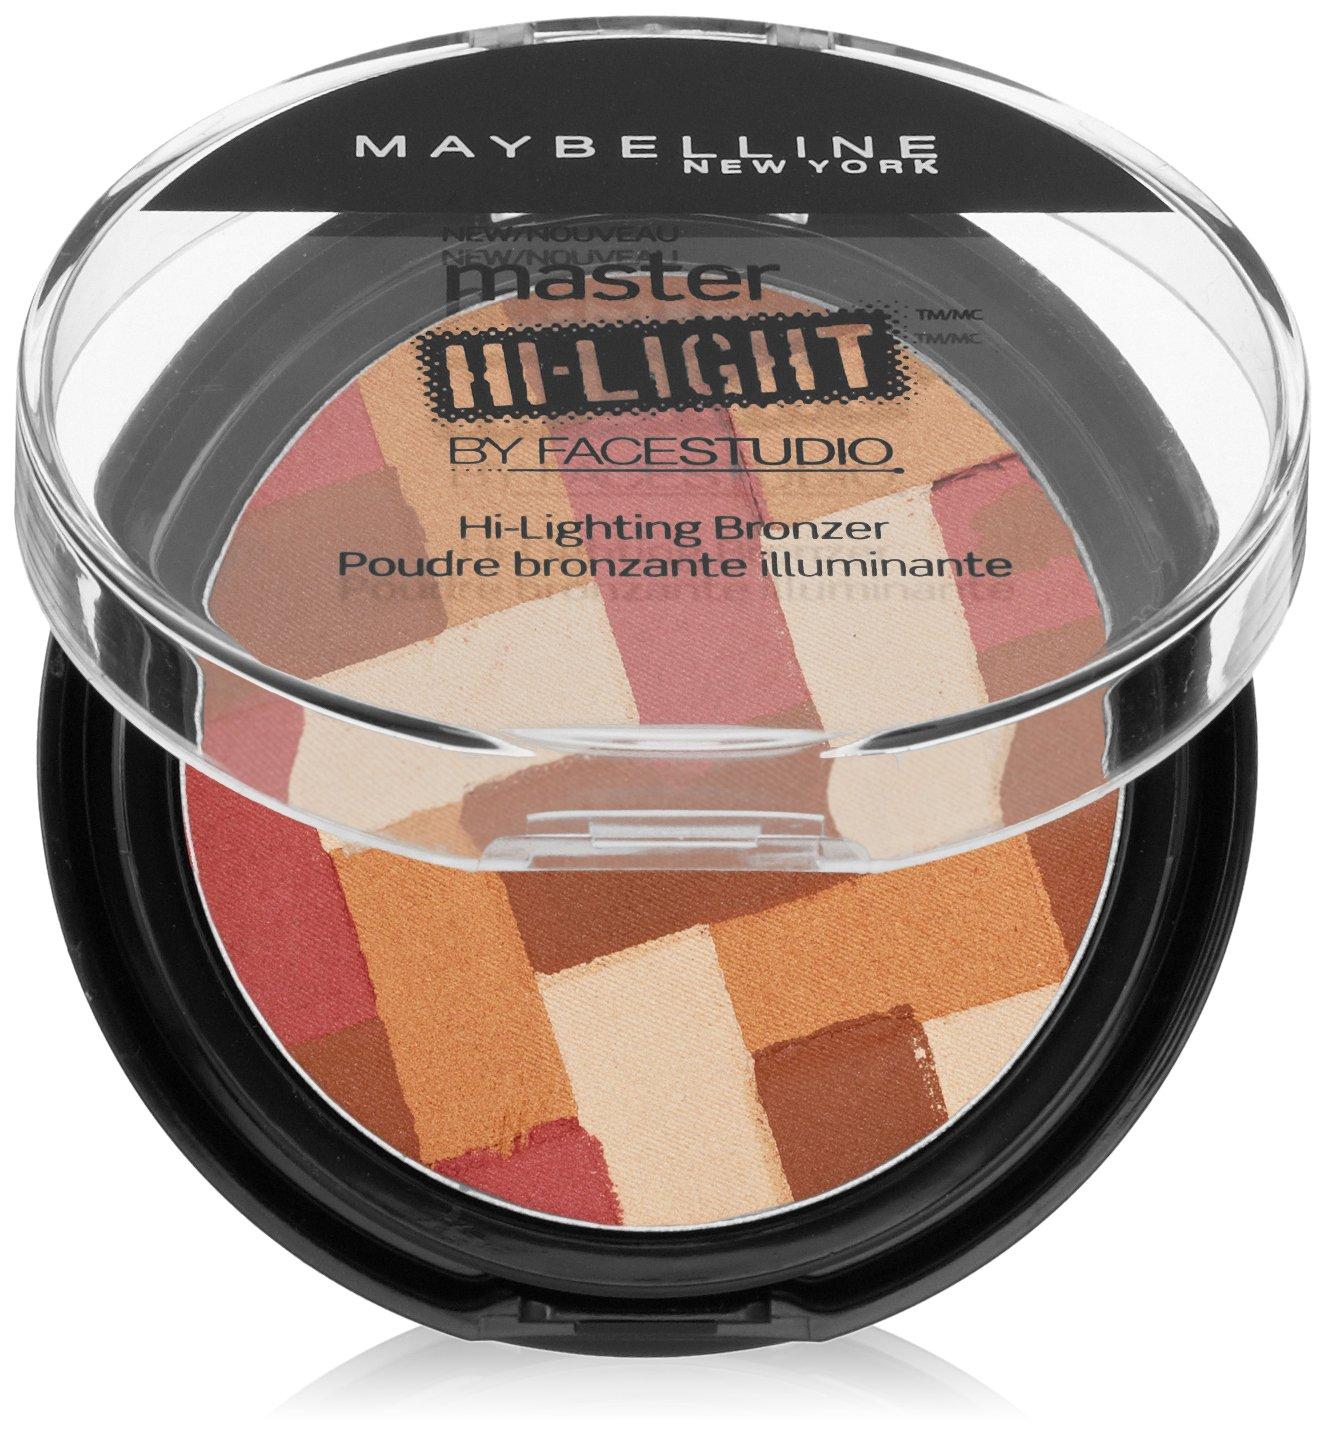 Maybelline New York Face Studio Master Hi-Light Bronzer, Light Bronze, 0.31 Ounce 409444/48-3/43-1